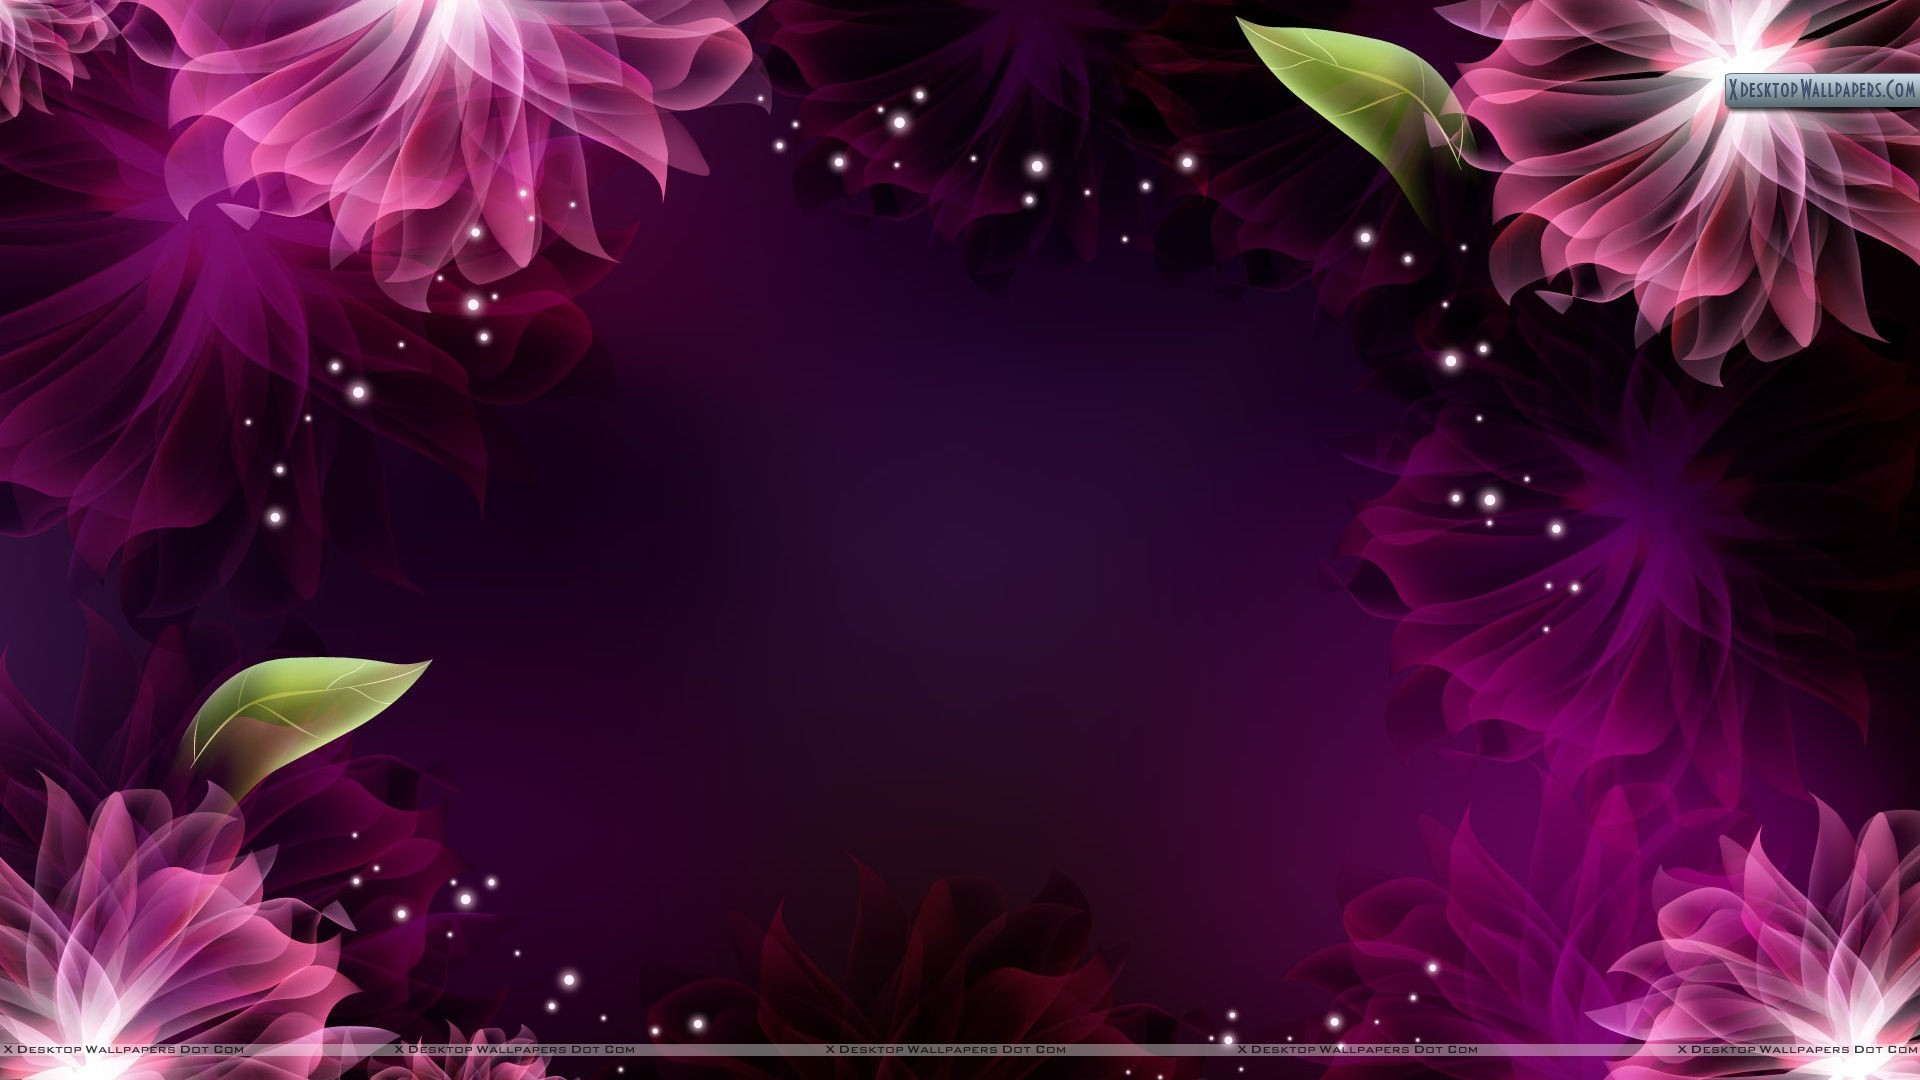 Flowers on Black Background Wallpaper Wide Wallpaper